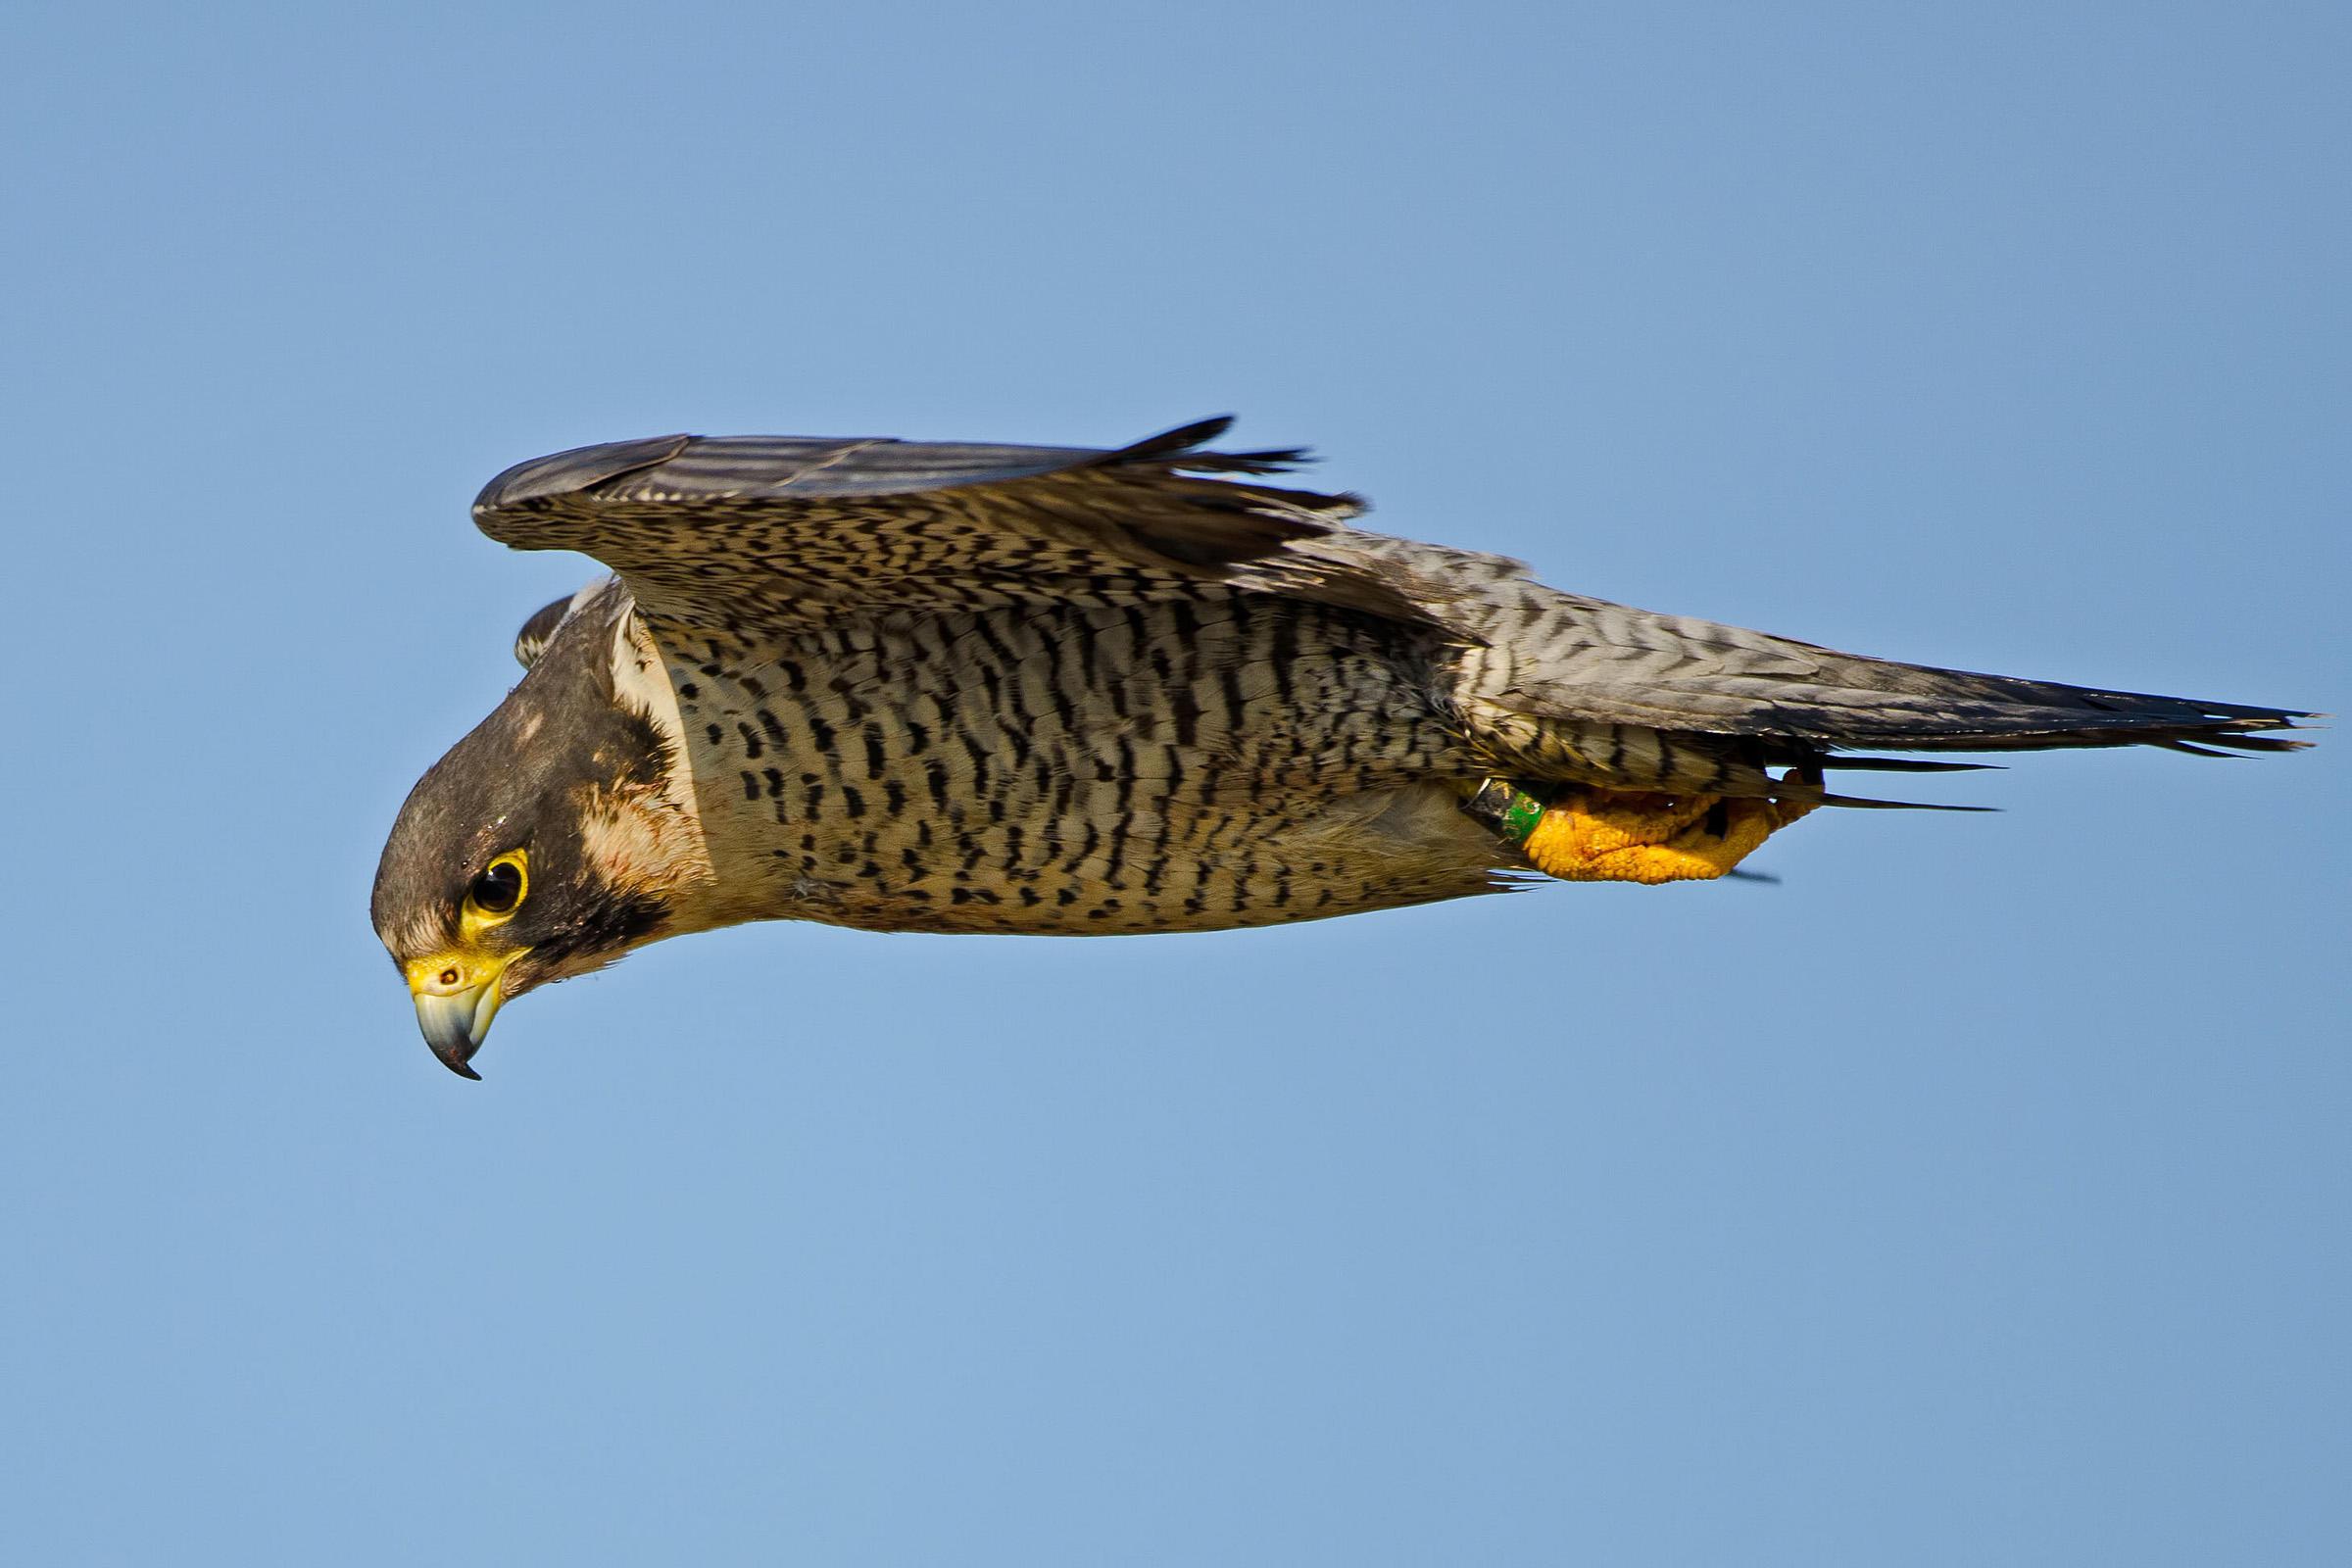 Falcon Medicine Soar Higher Than Ever Before